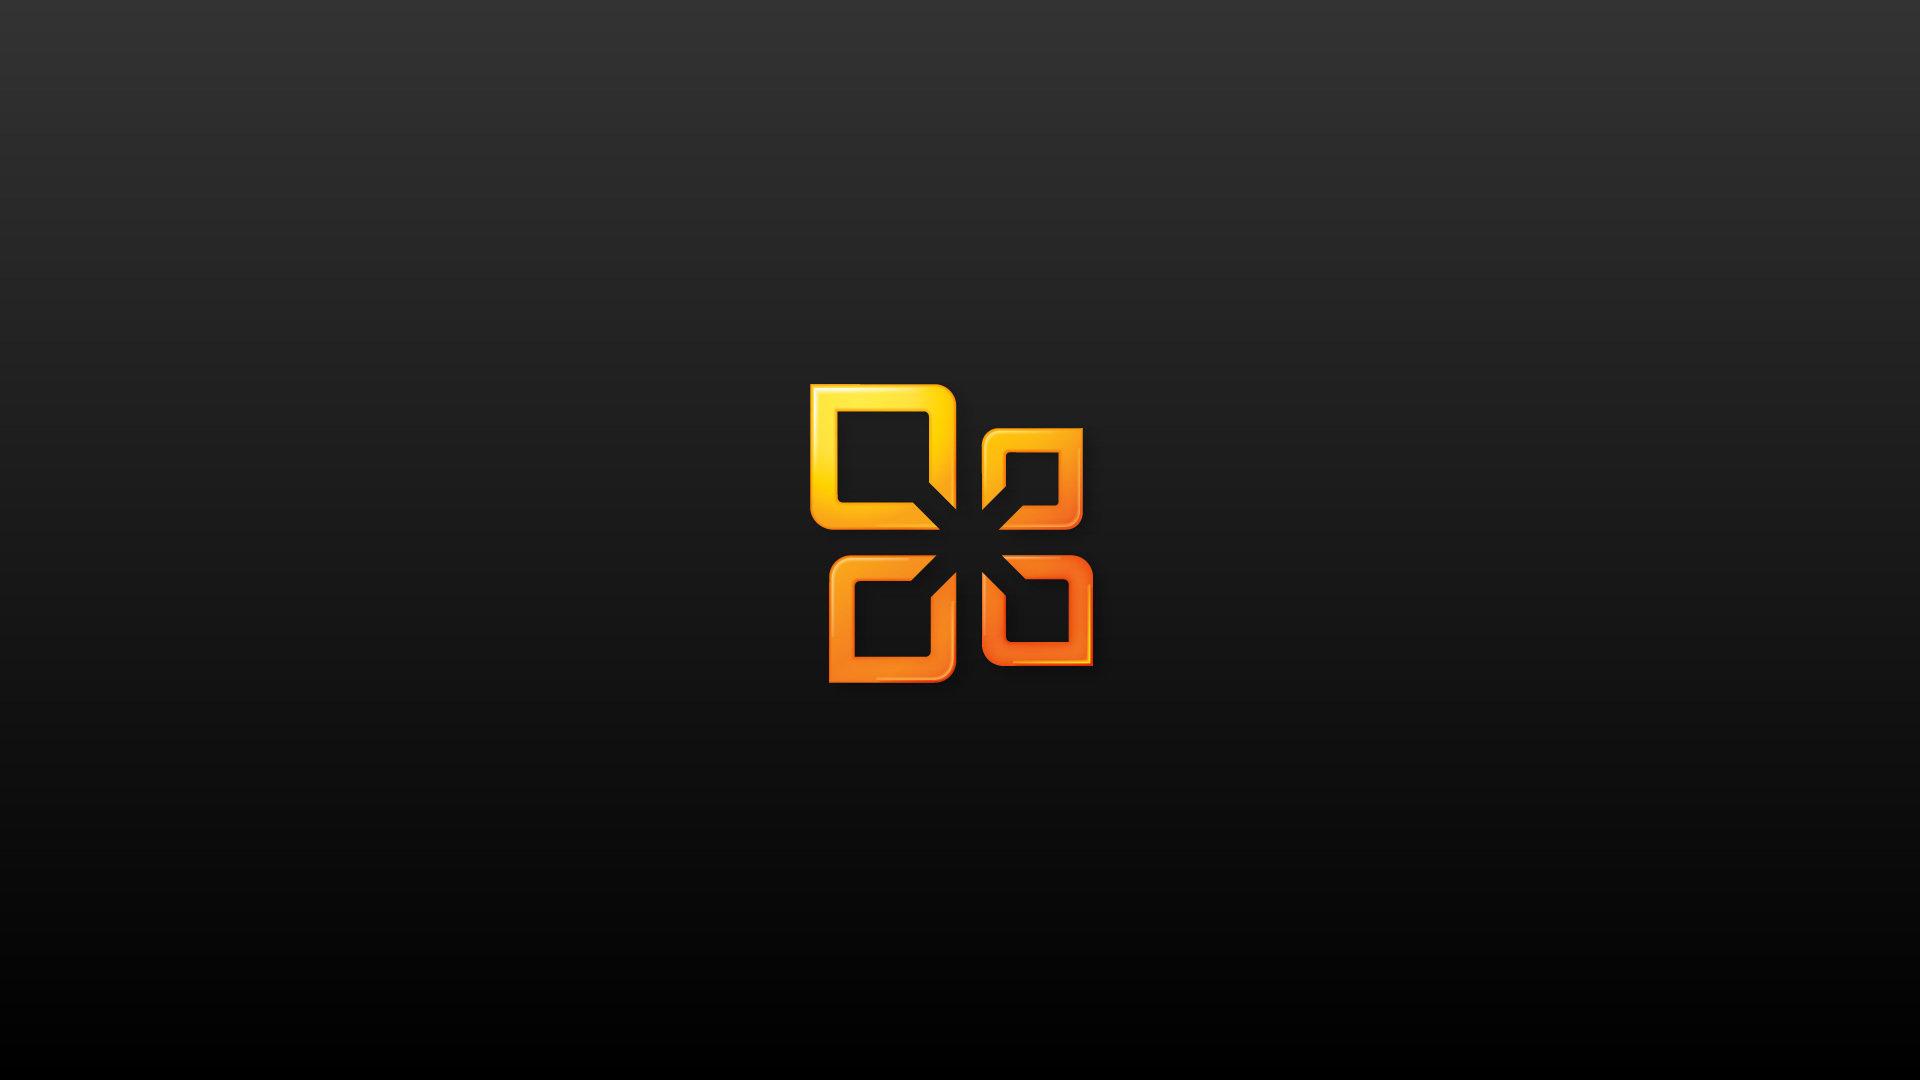 Download Hd 1080p Microsoft Office Desktop Wallpaper ID310512 For Free